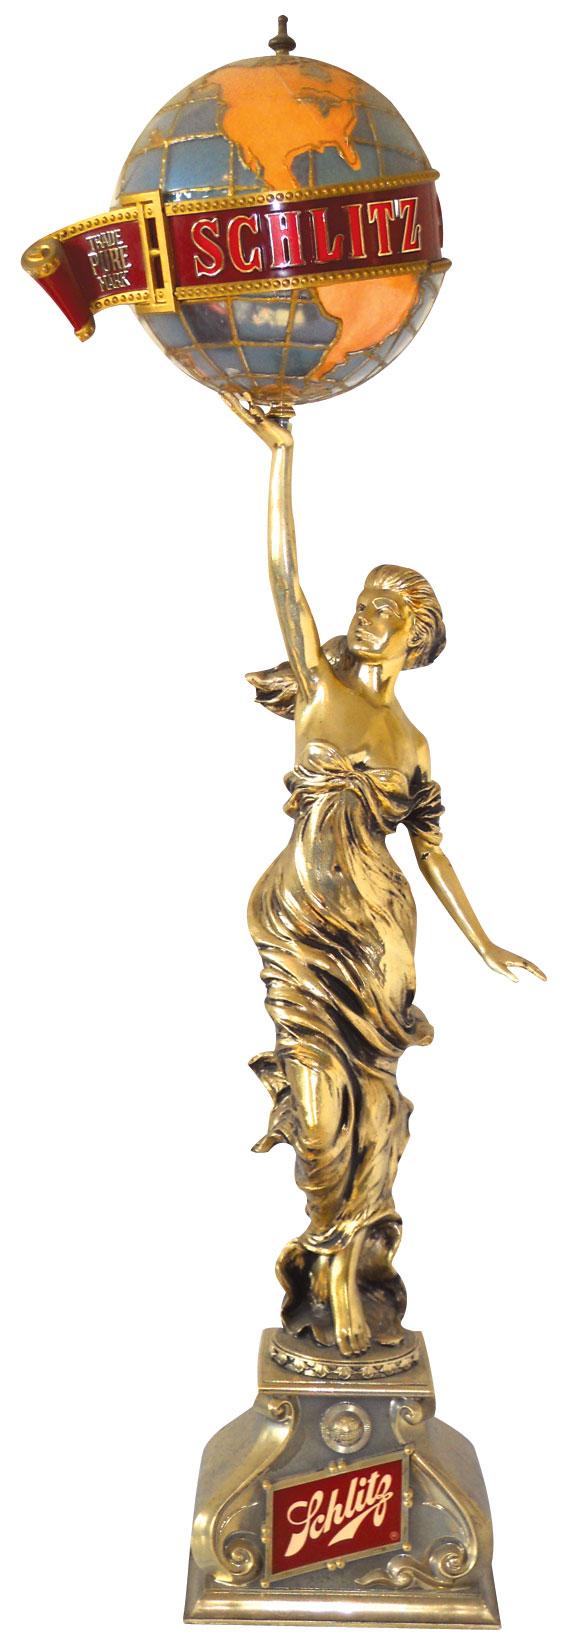 schlitz-statue-globe